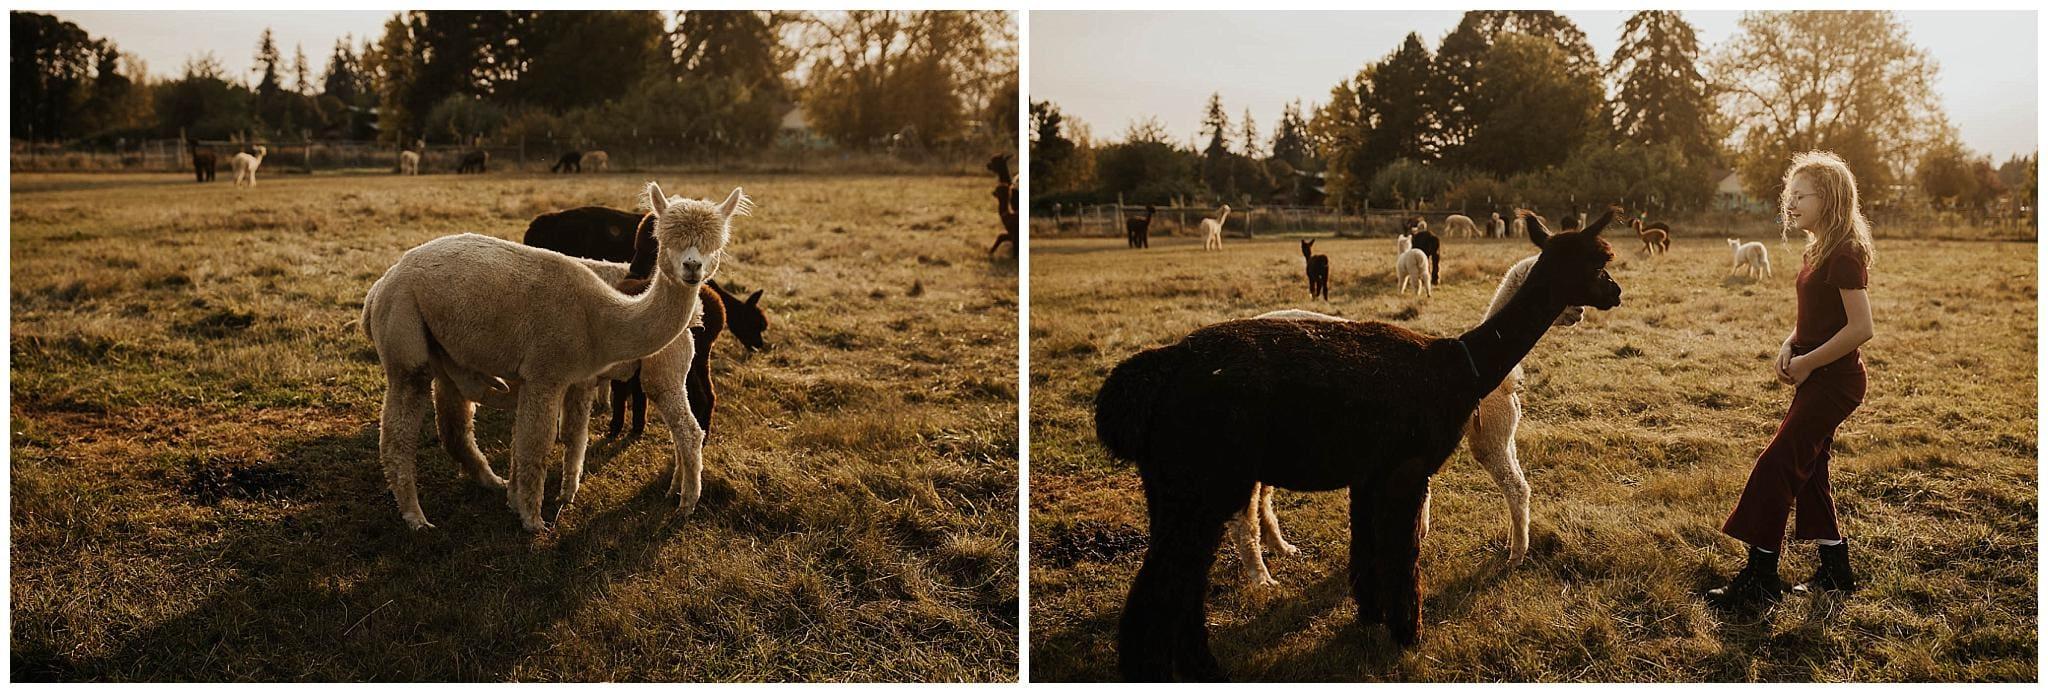 fluffy adorable alpacas on a farm near portland oregon